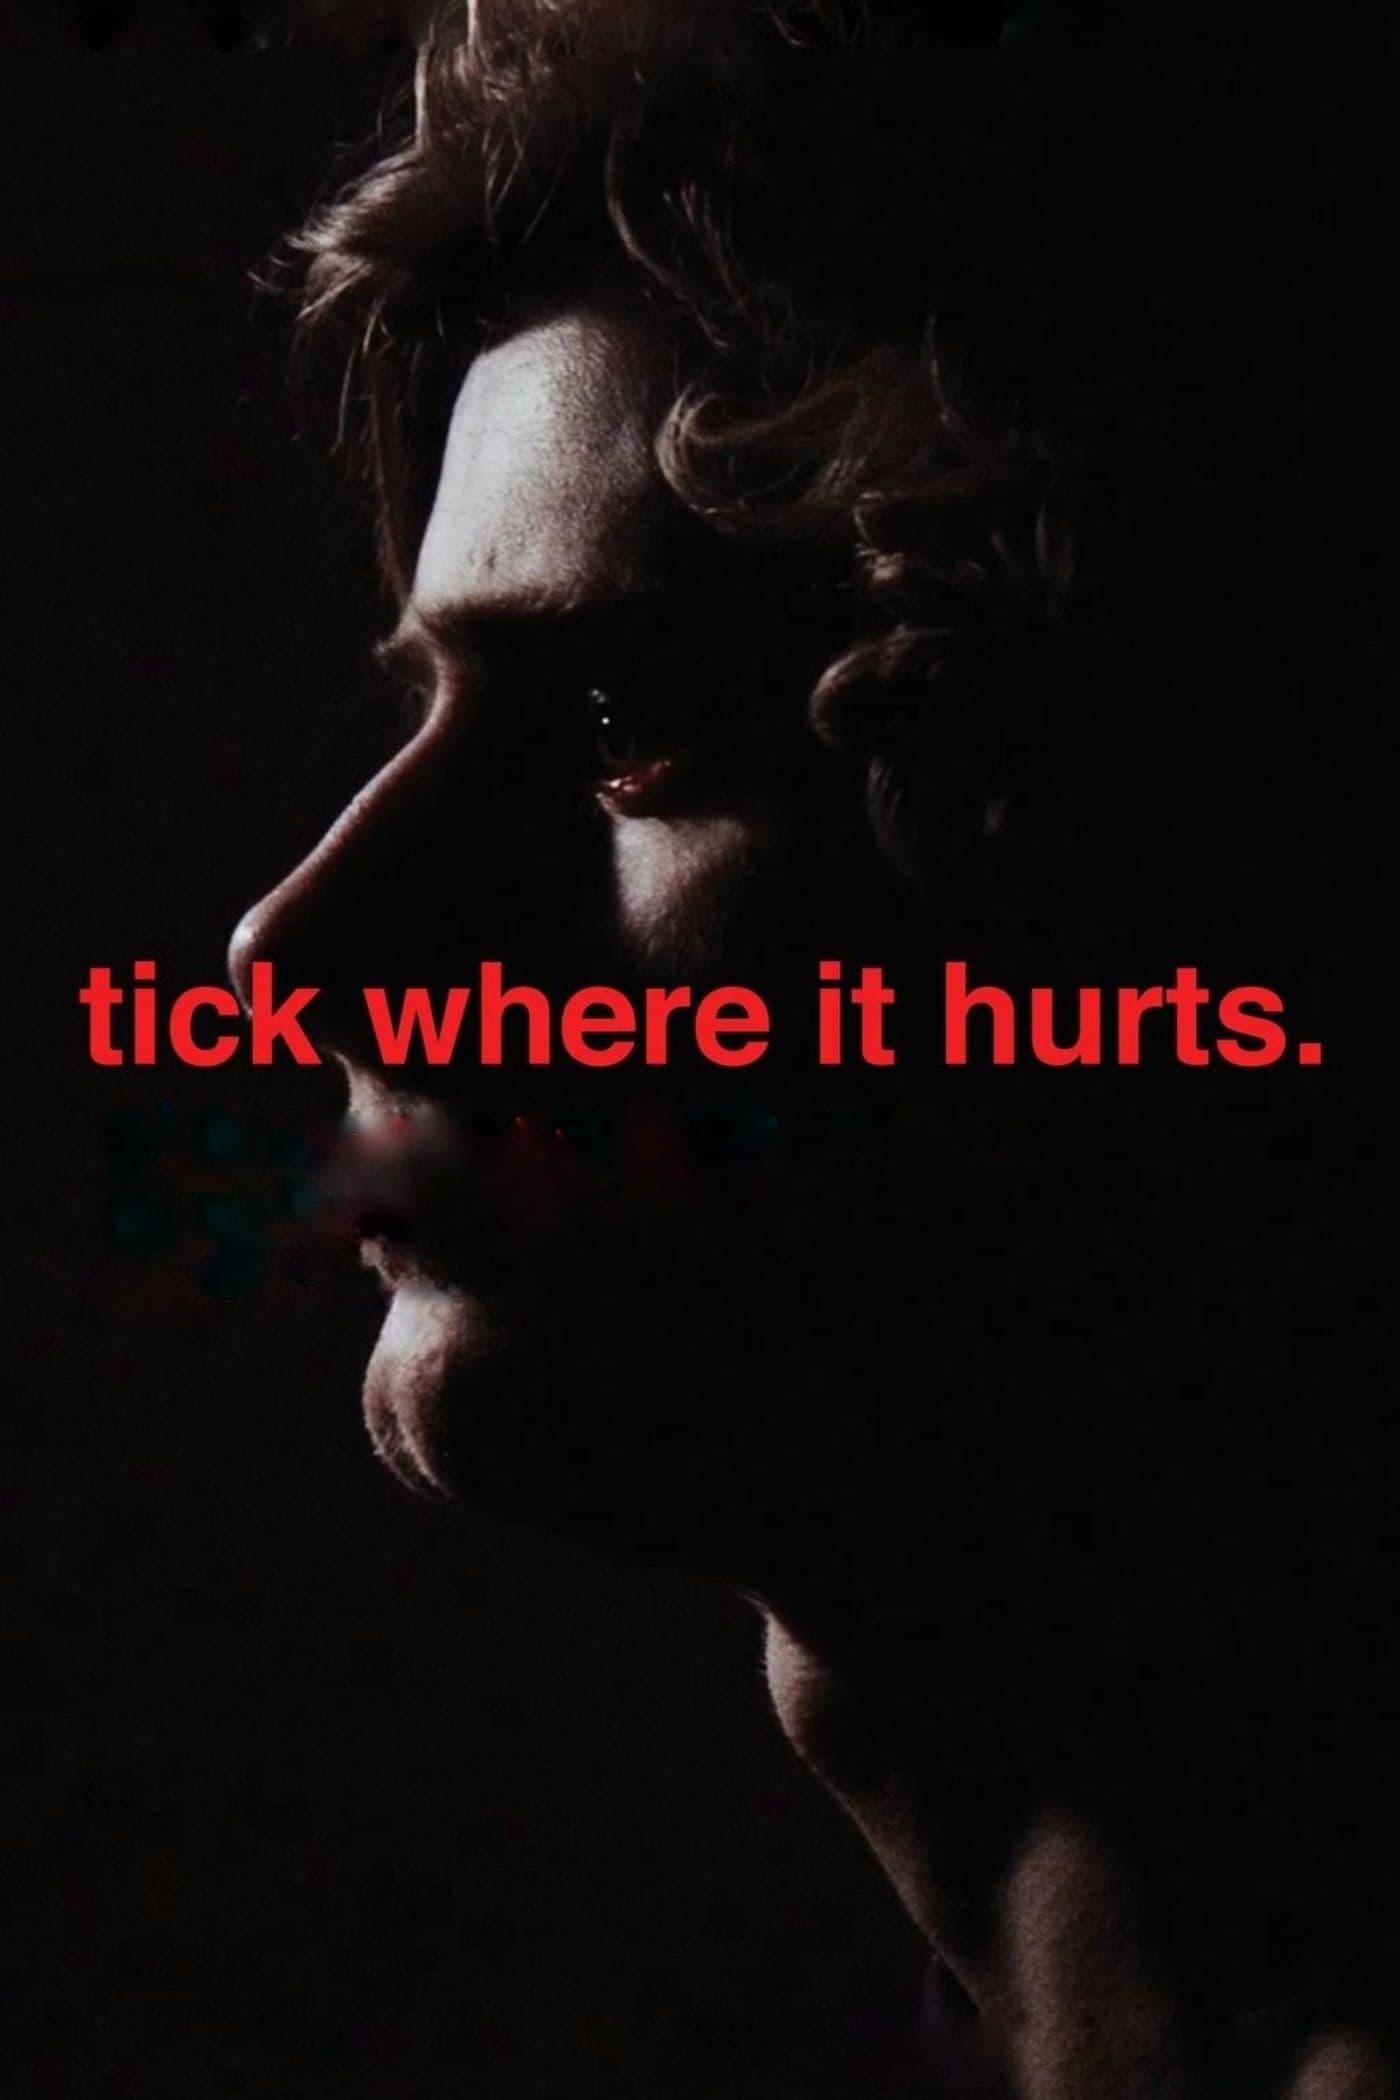 Tick Where It Hurts